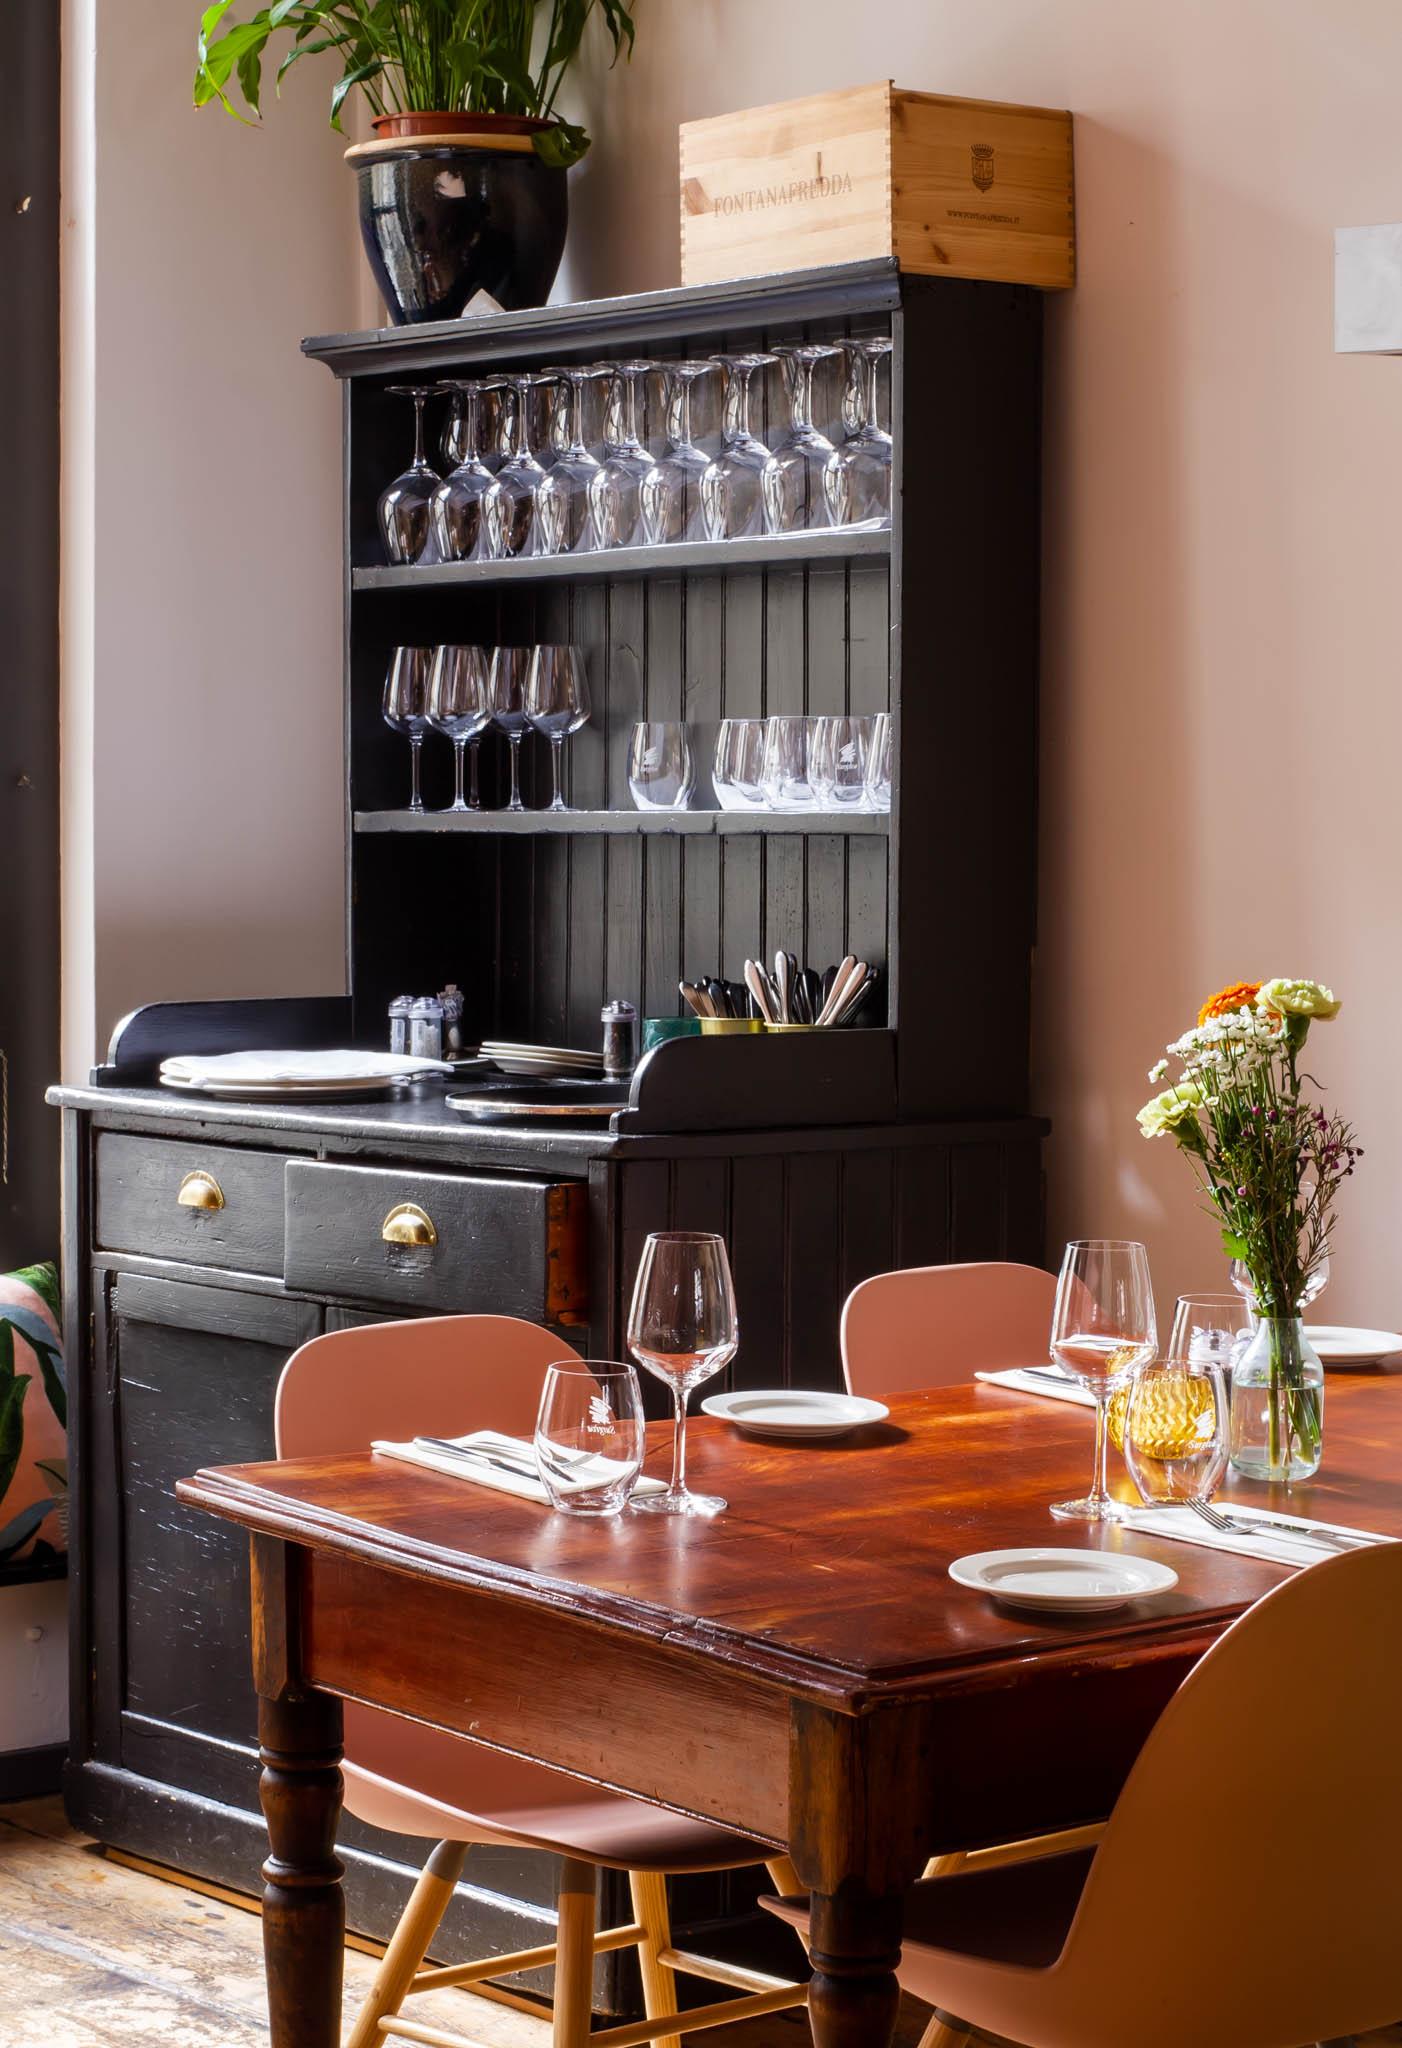 Interior of an Italian restaurant